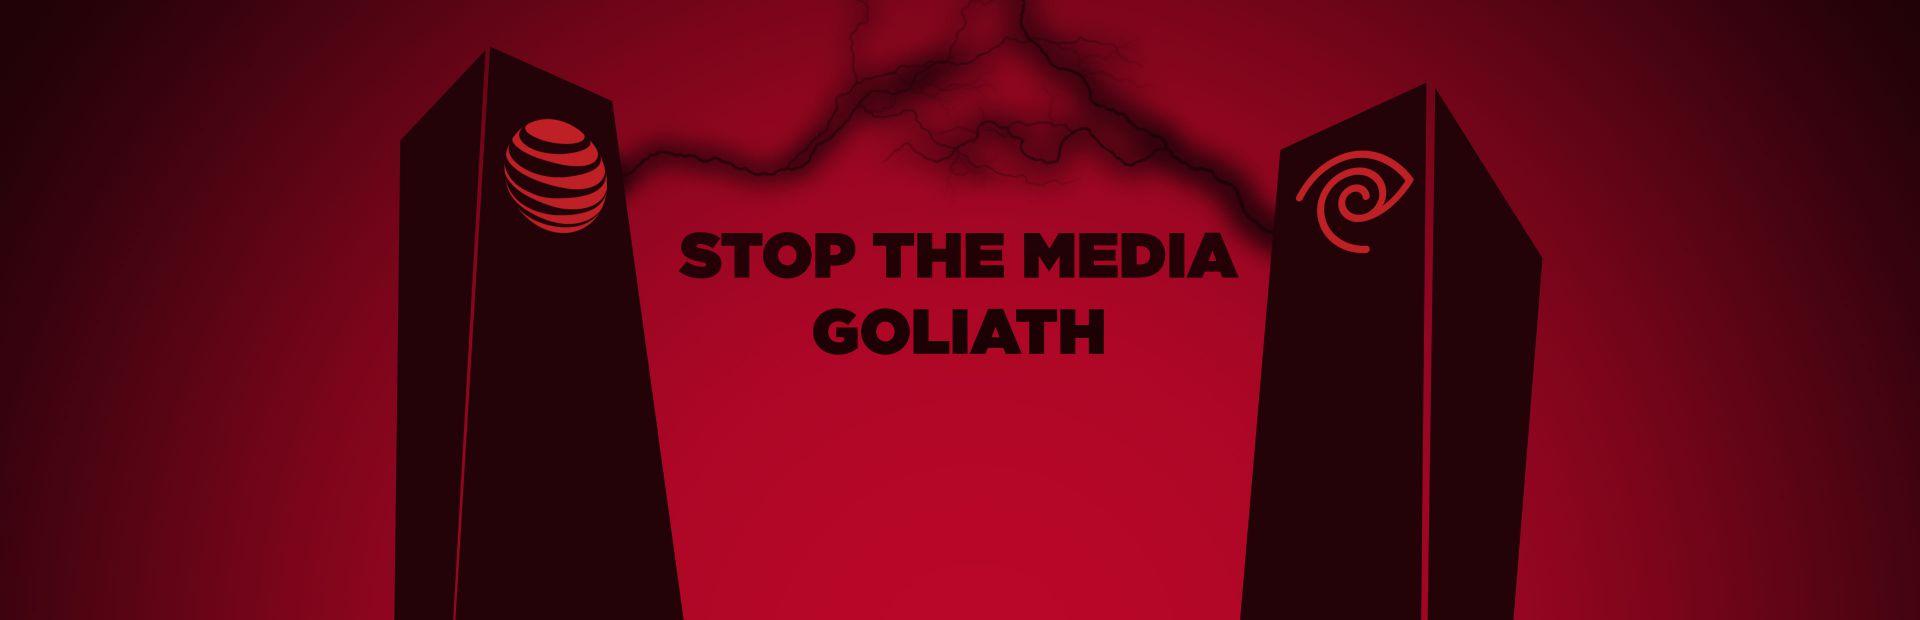 Stop the Media Goliath